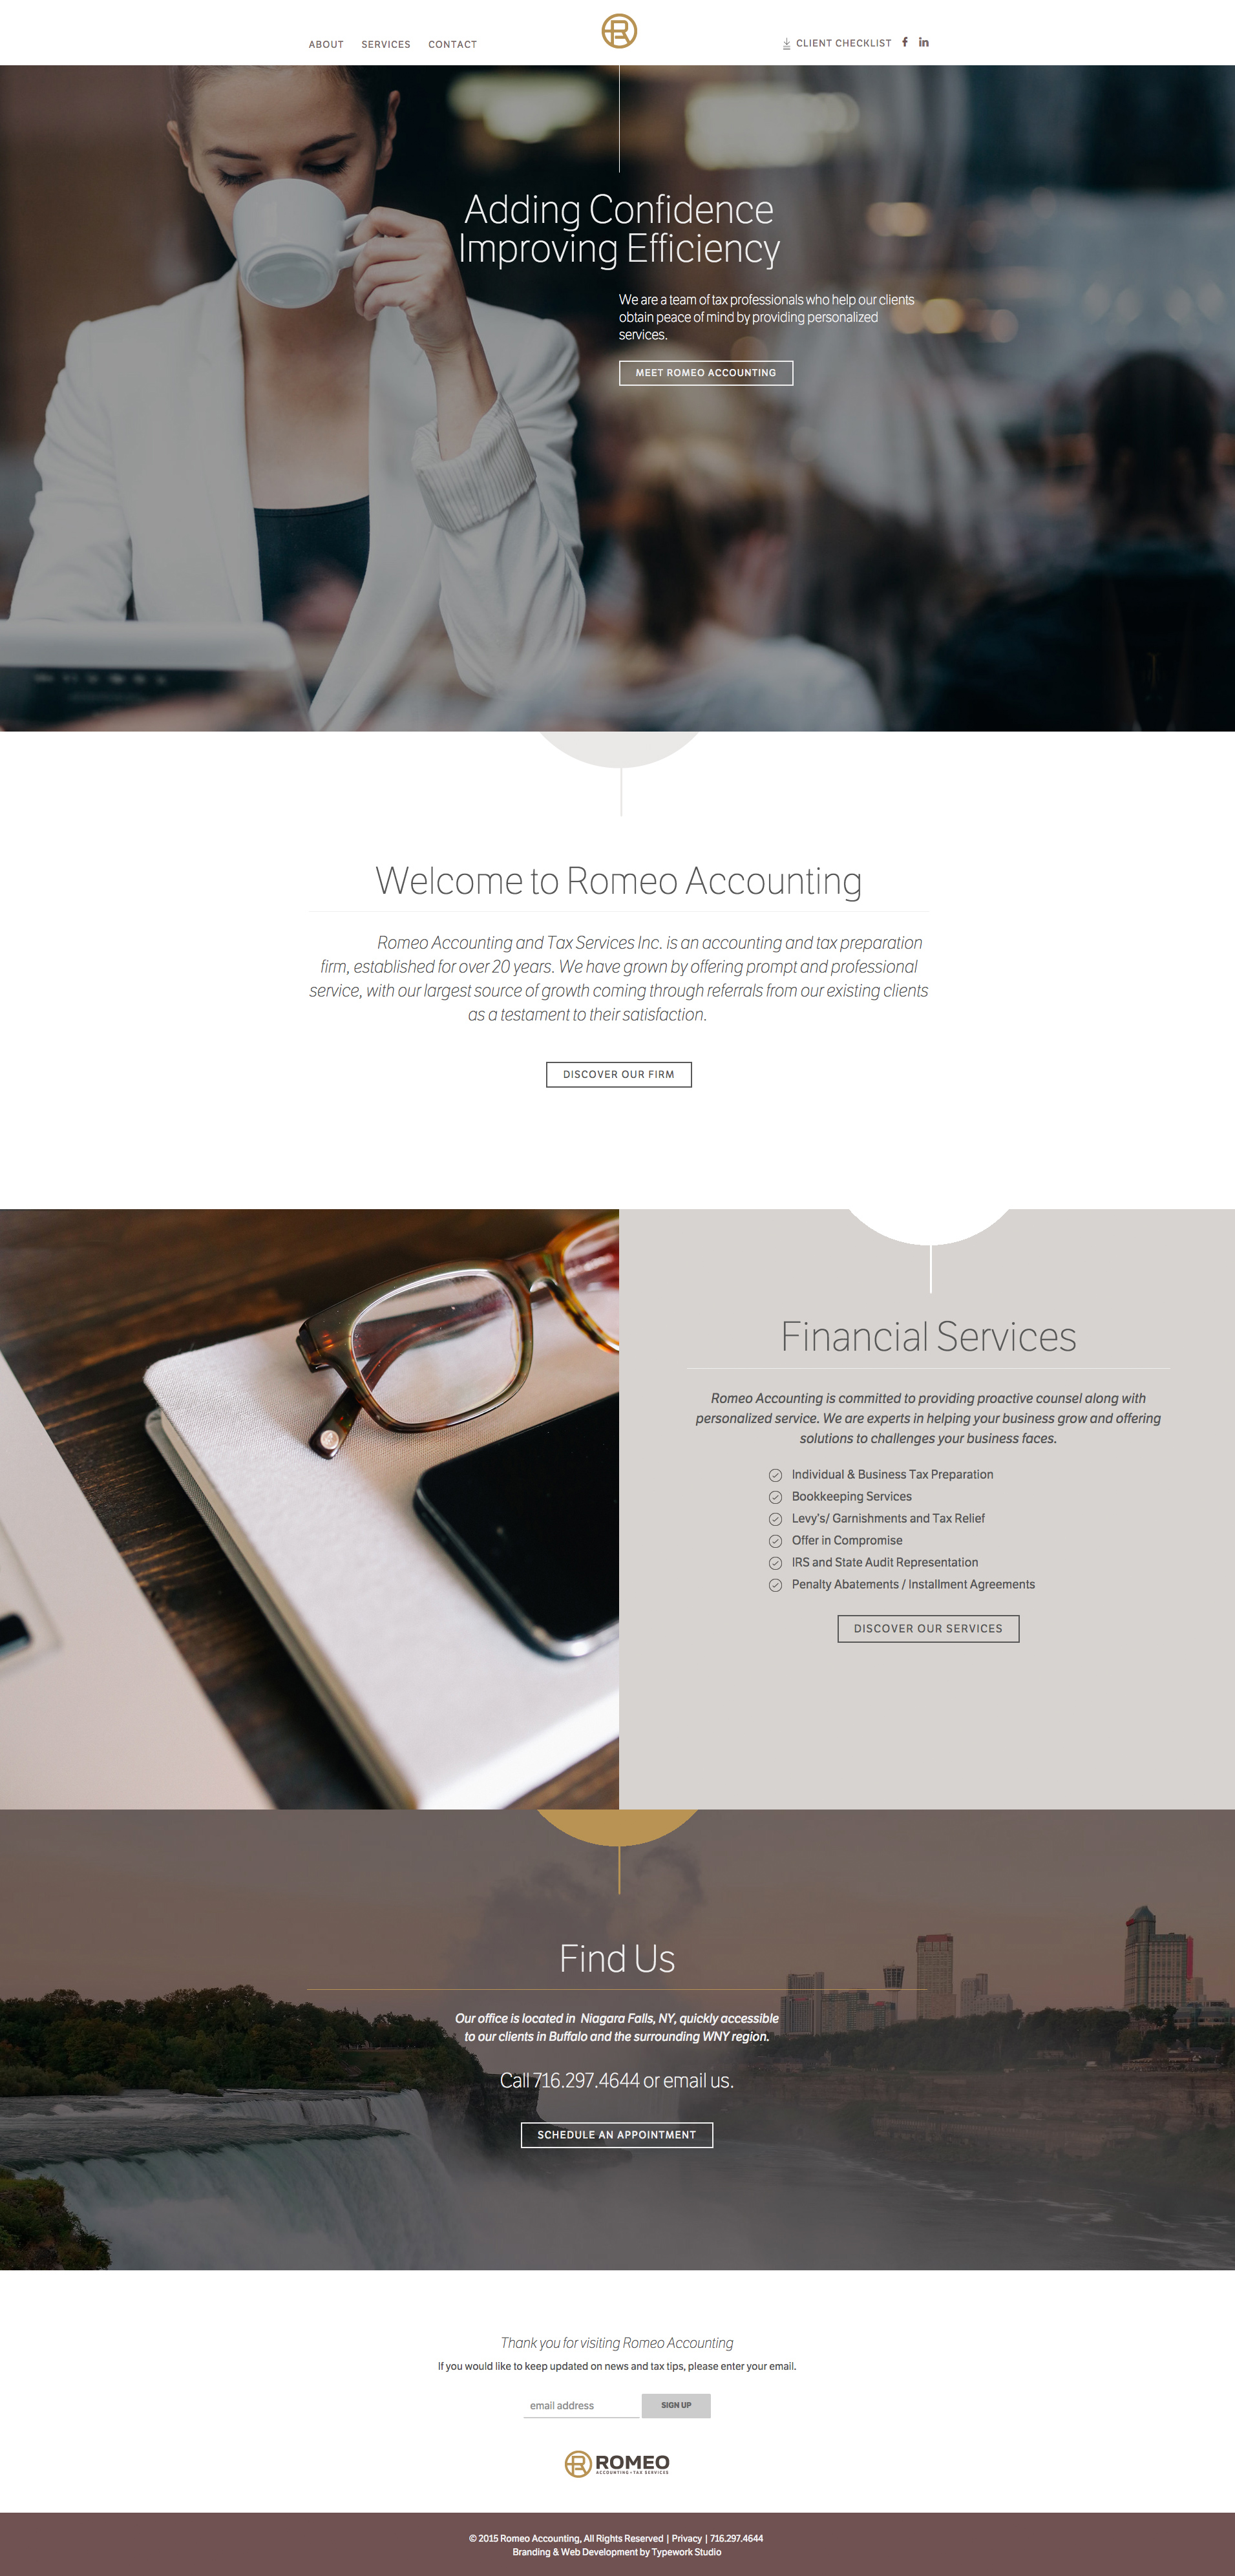 Romeo Accounting CMS Web Design